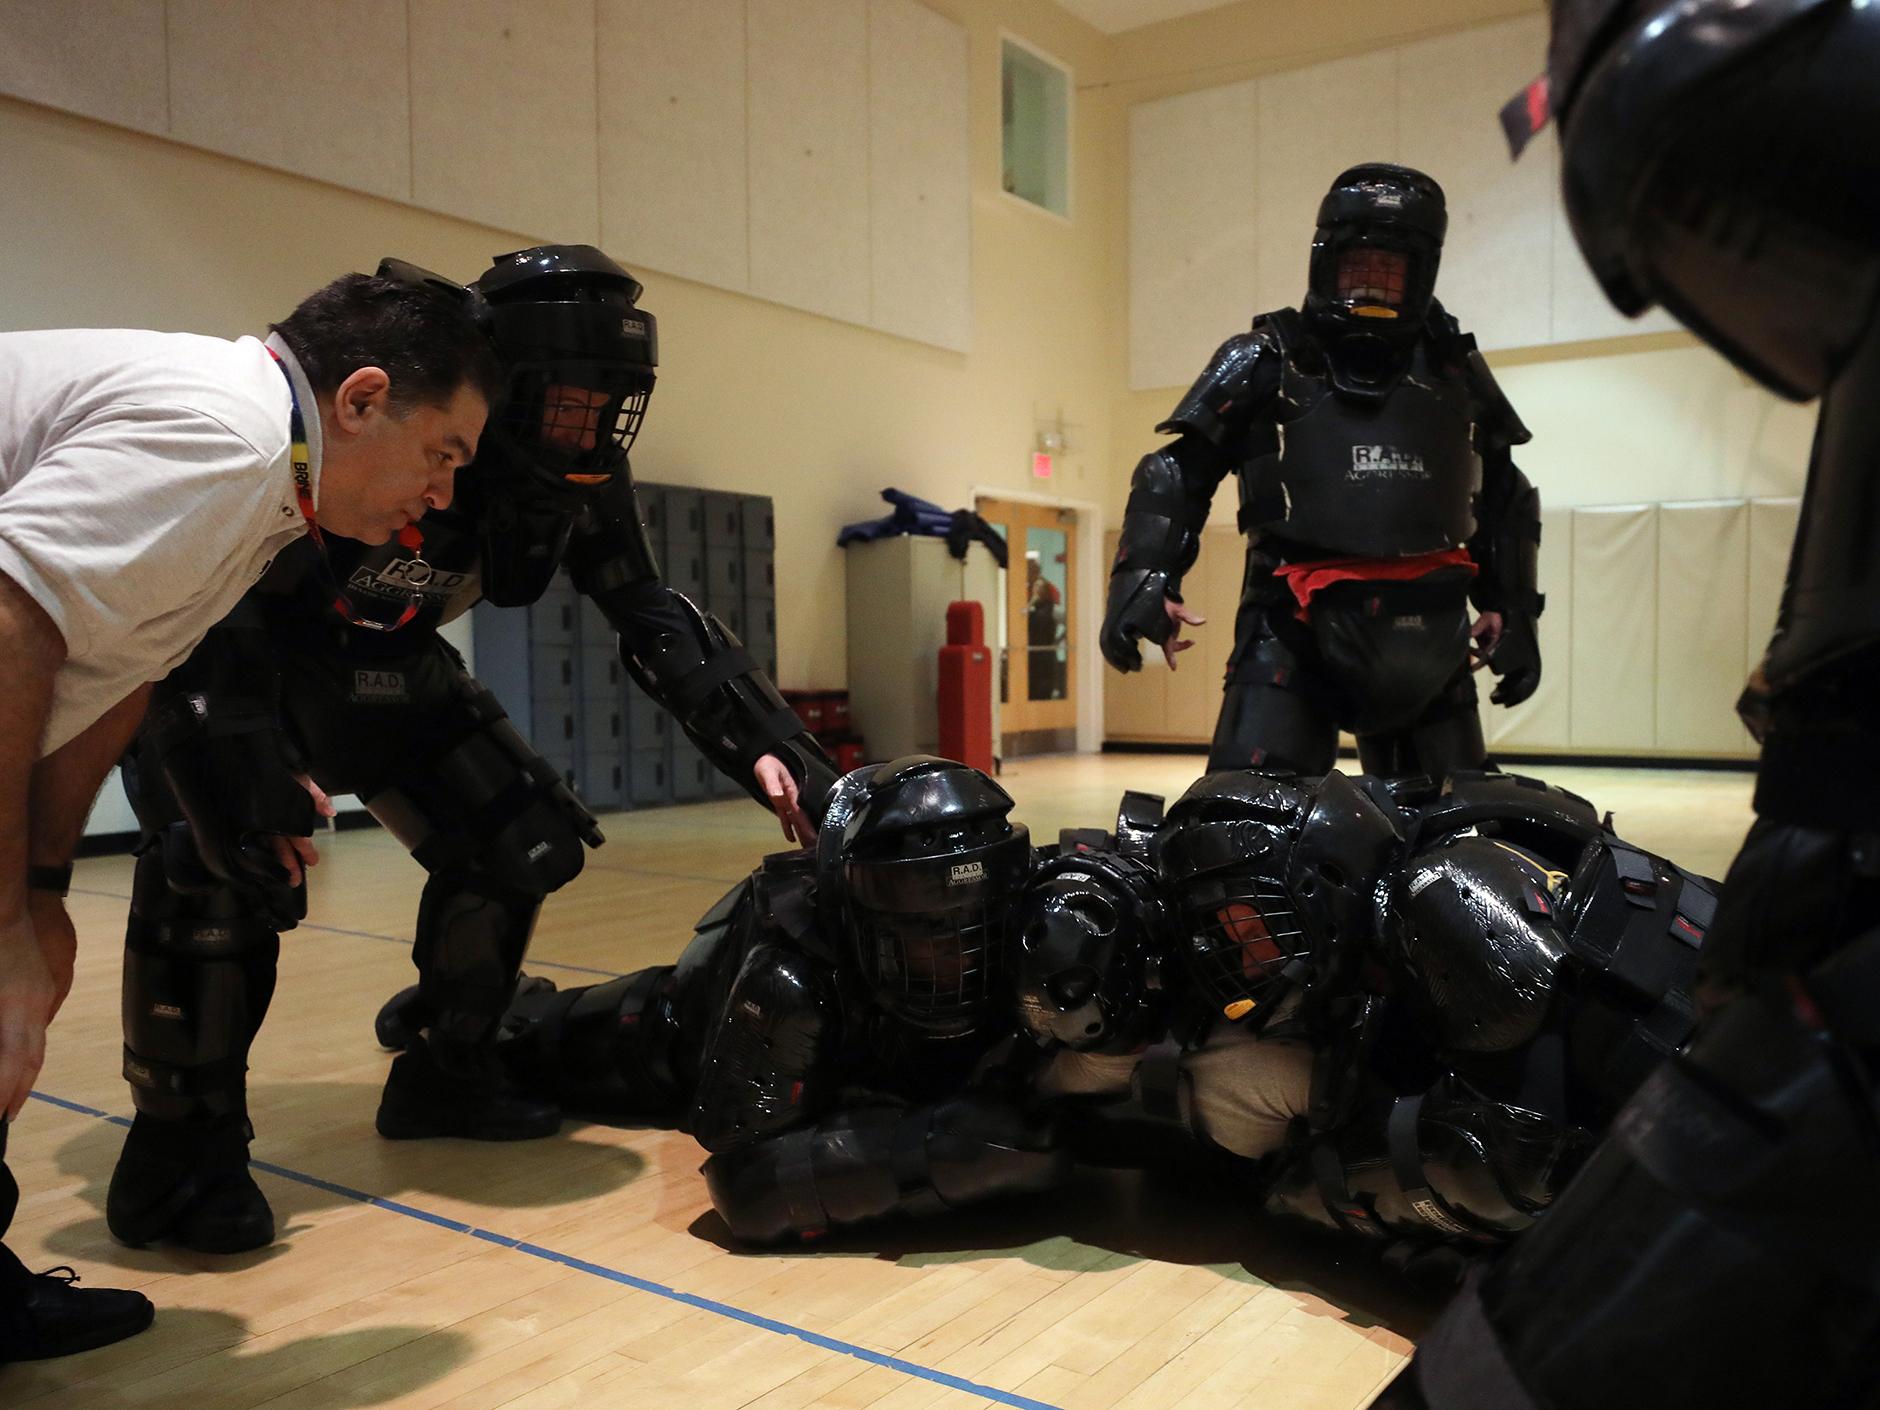 Rad systems instructor training